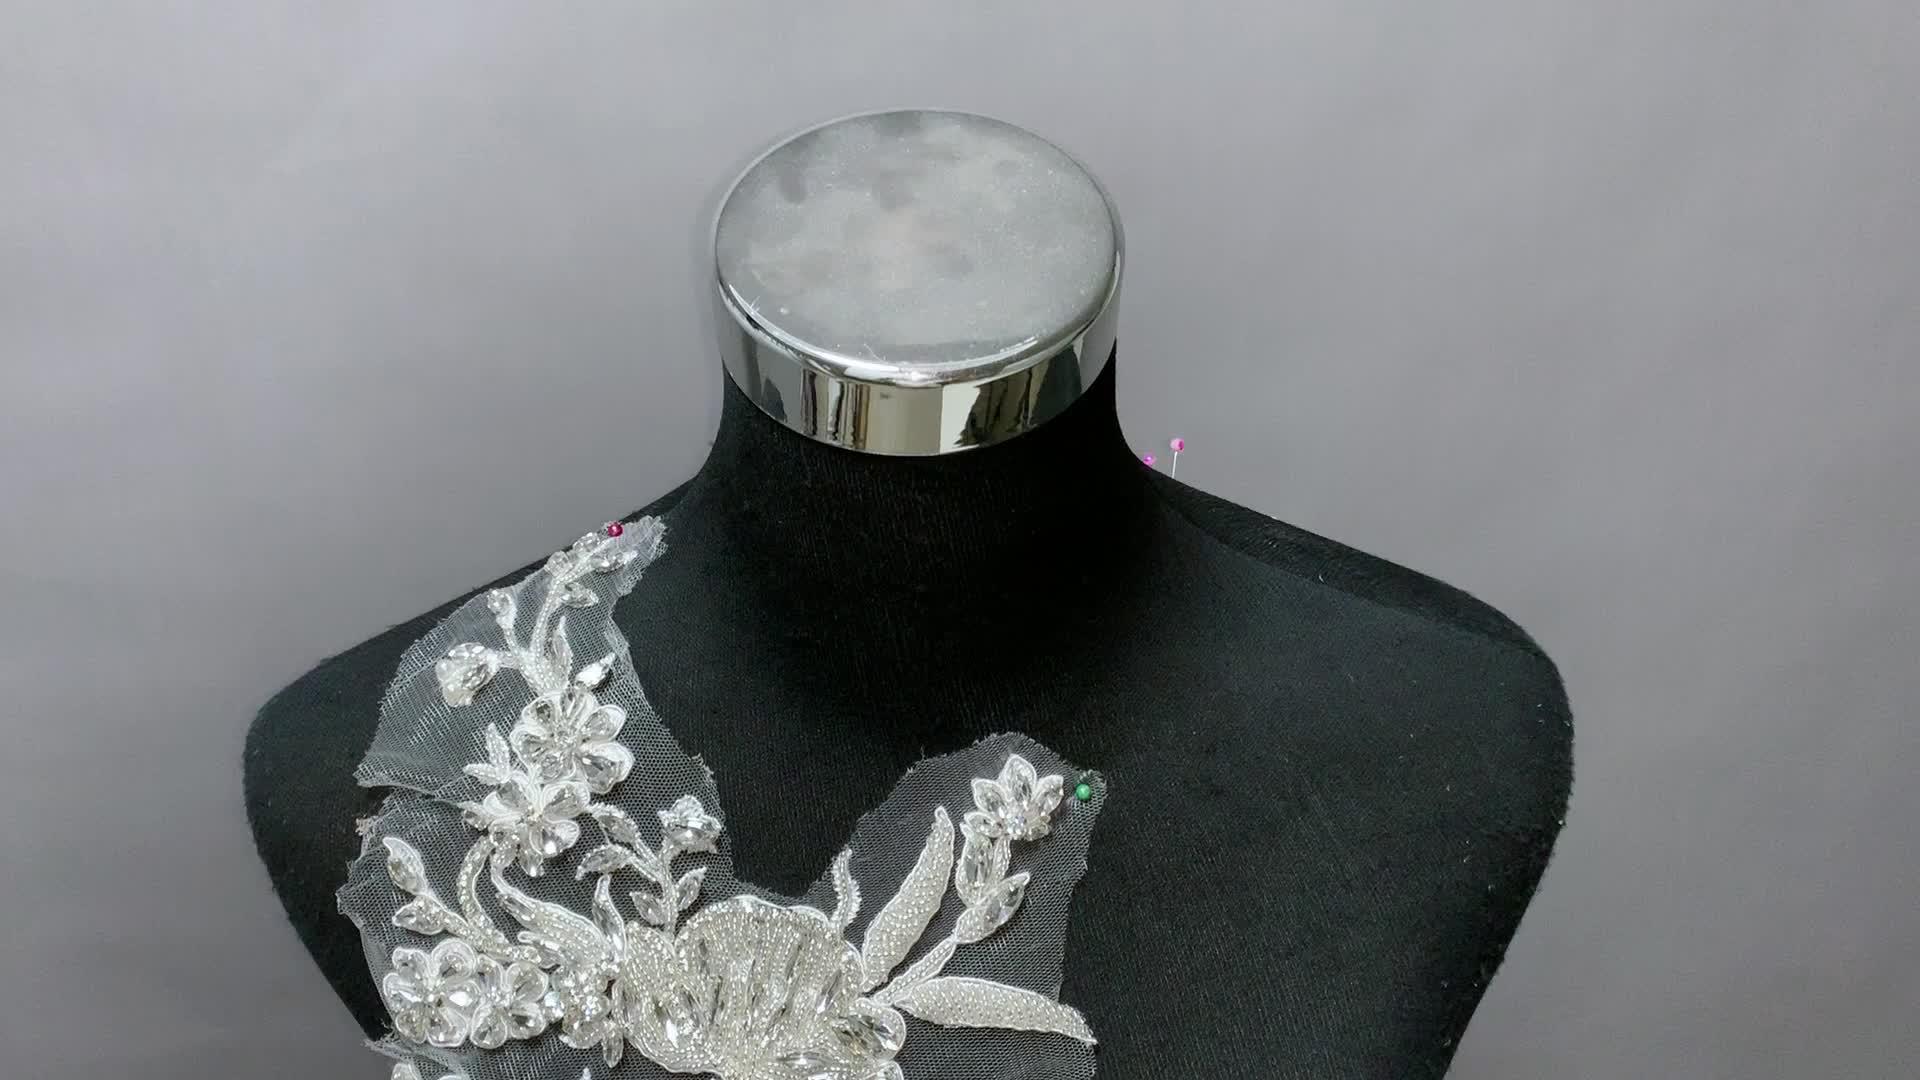 Original handmade sew on beaded bridal sequin sash hotfix rhinestone bodice neckline crystal rhinestone applique